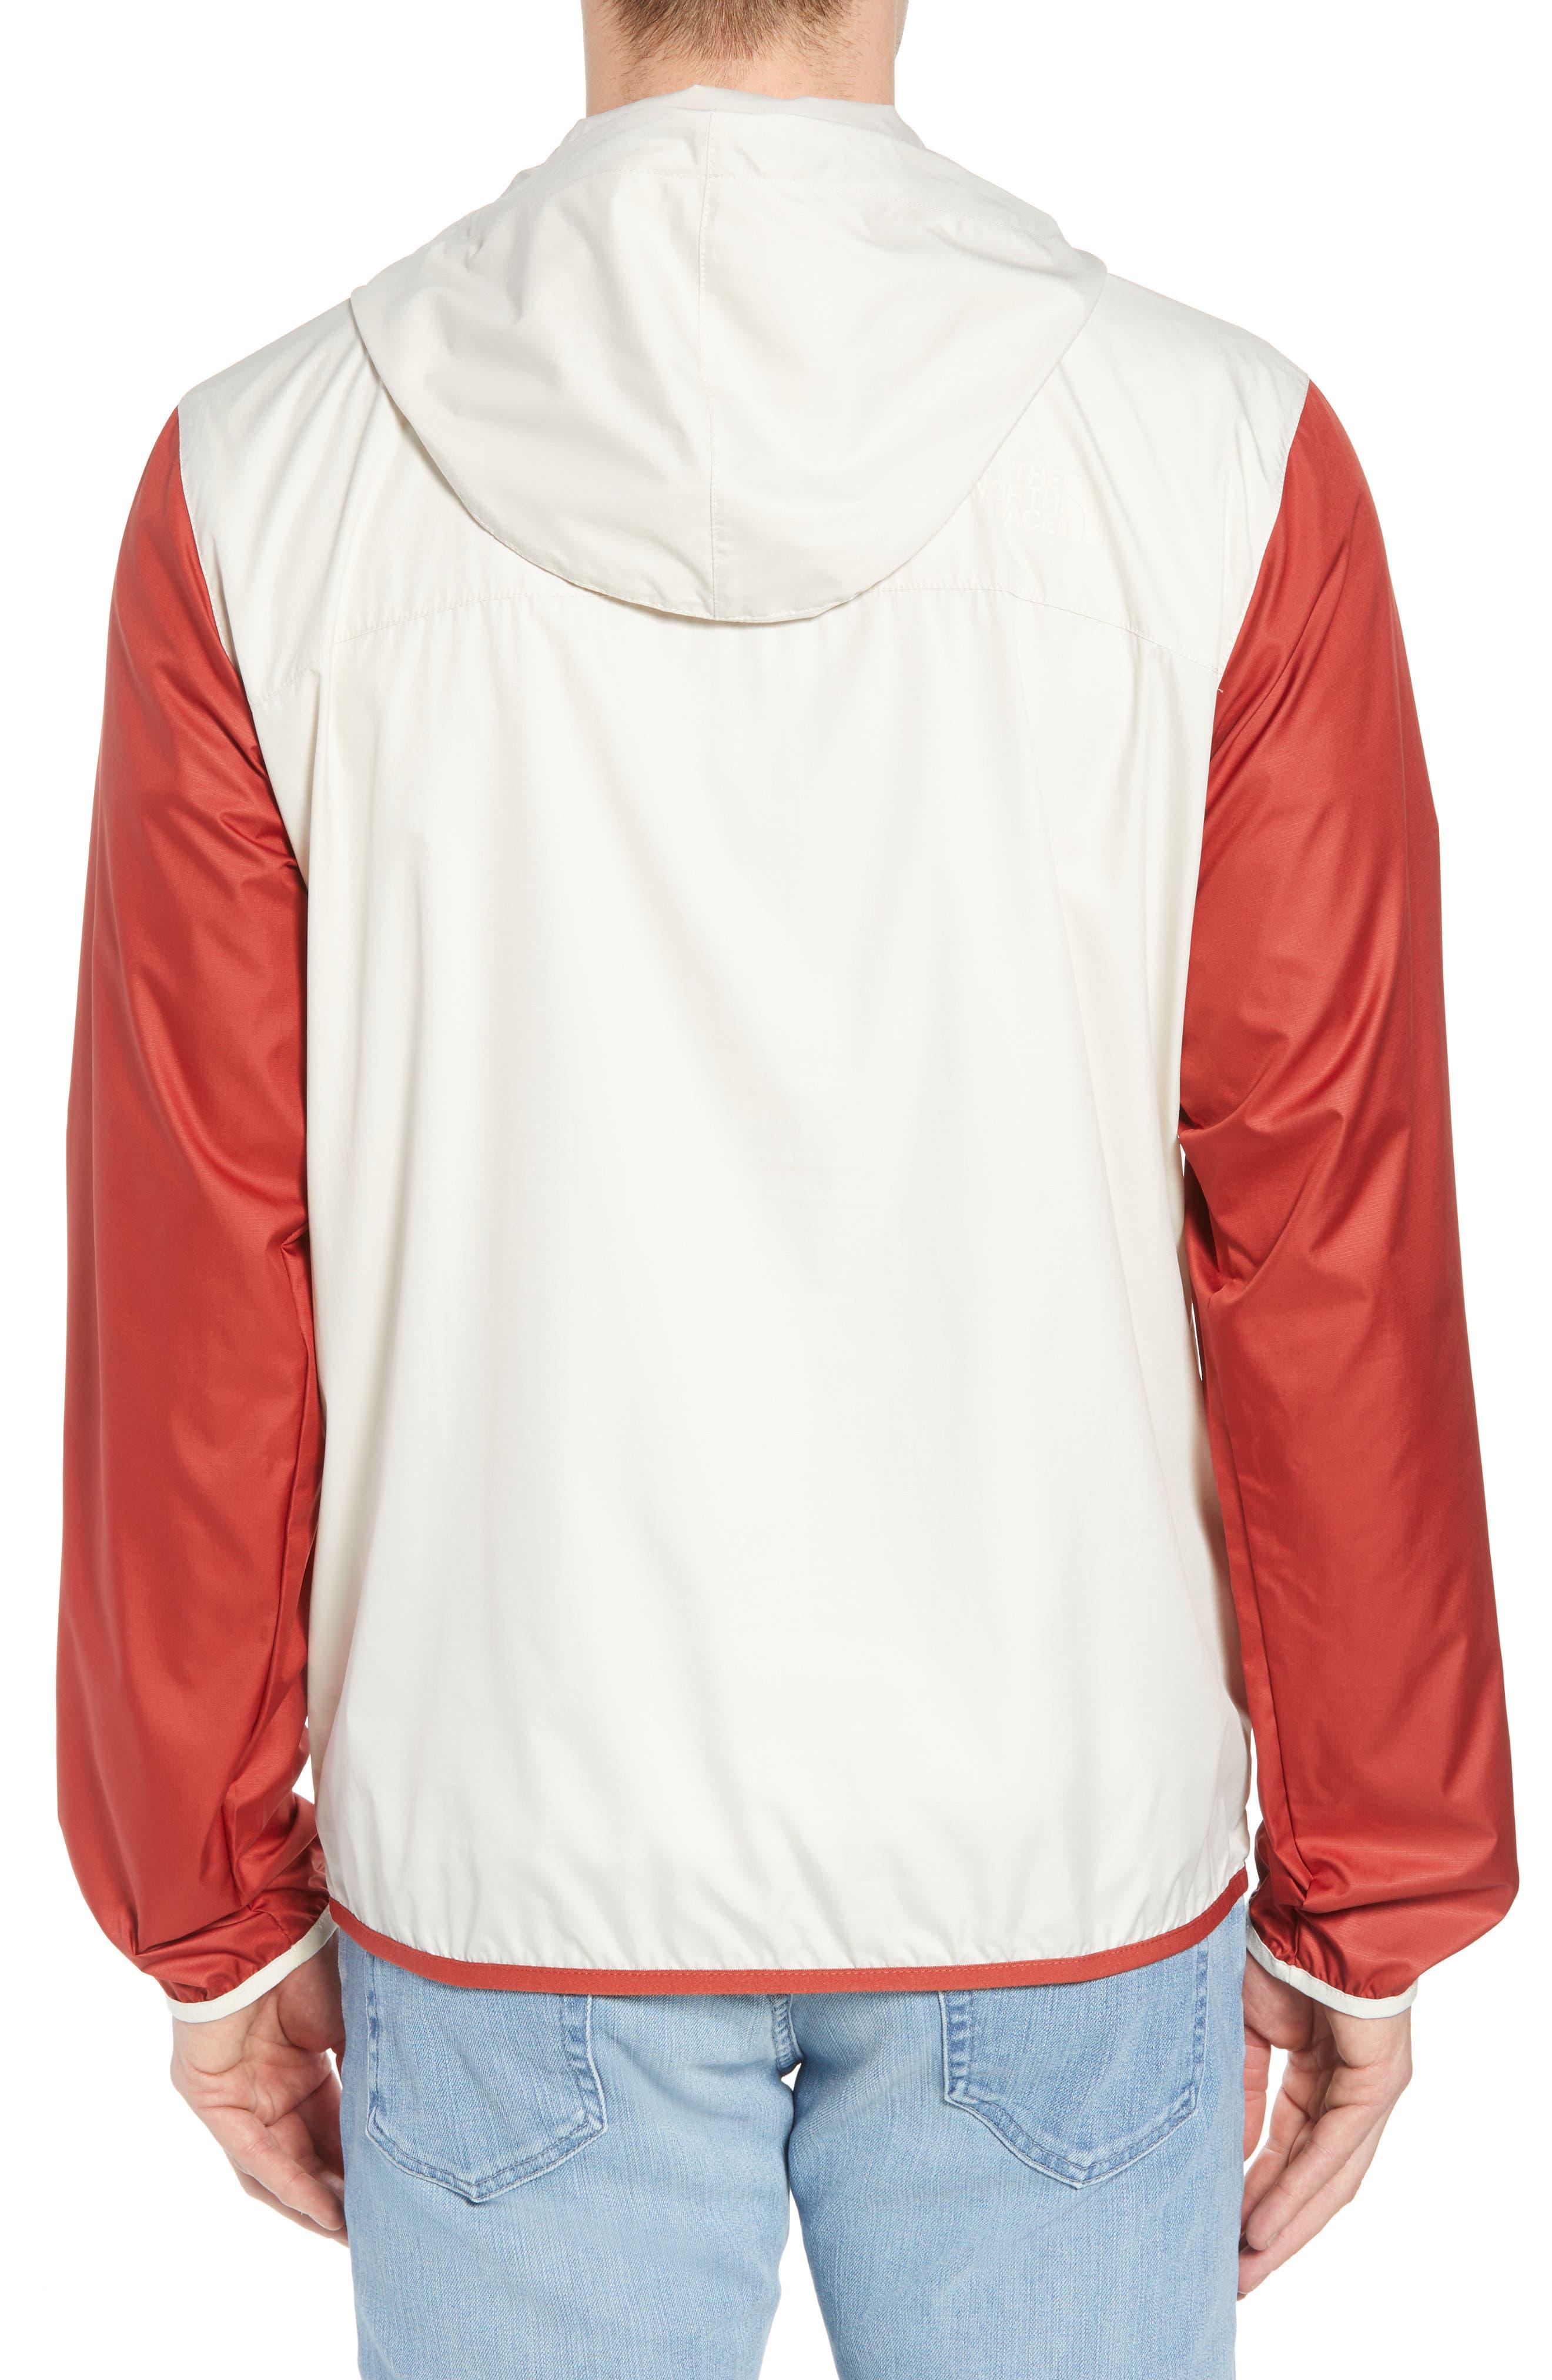 Fanorak Pullover,                             Alternate thumbnail 2, color,                             Vintage White Multi